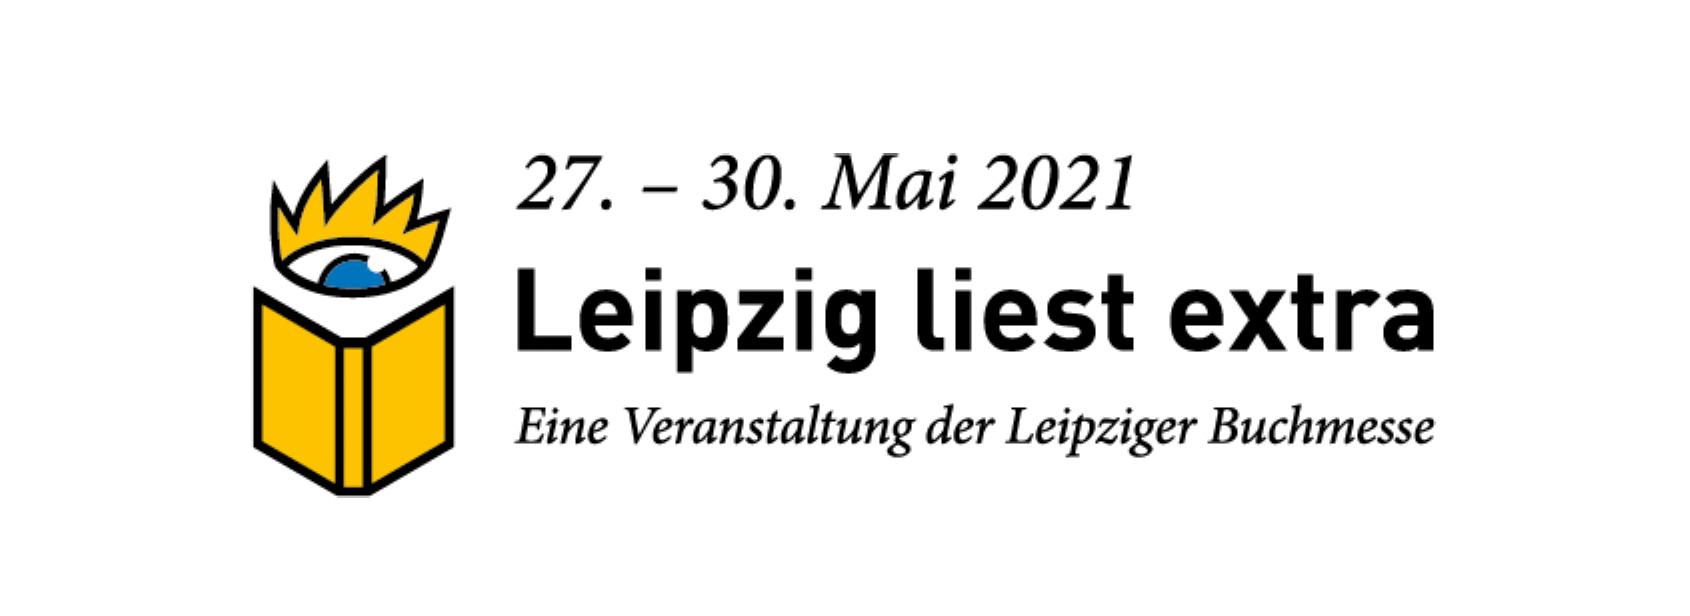 Leipzig liest extra